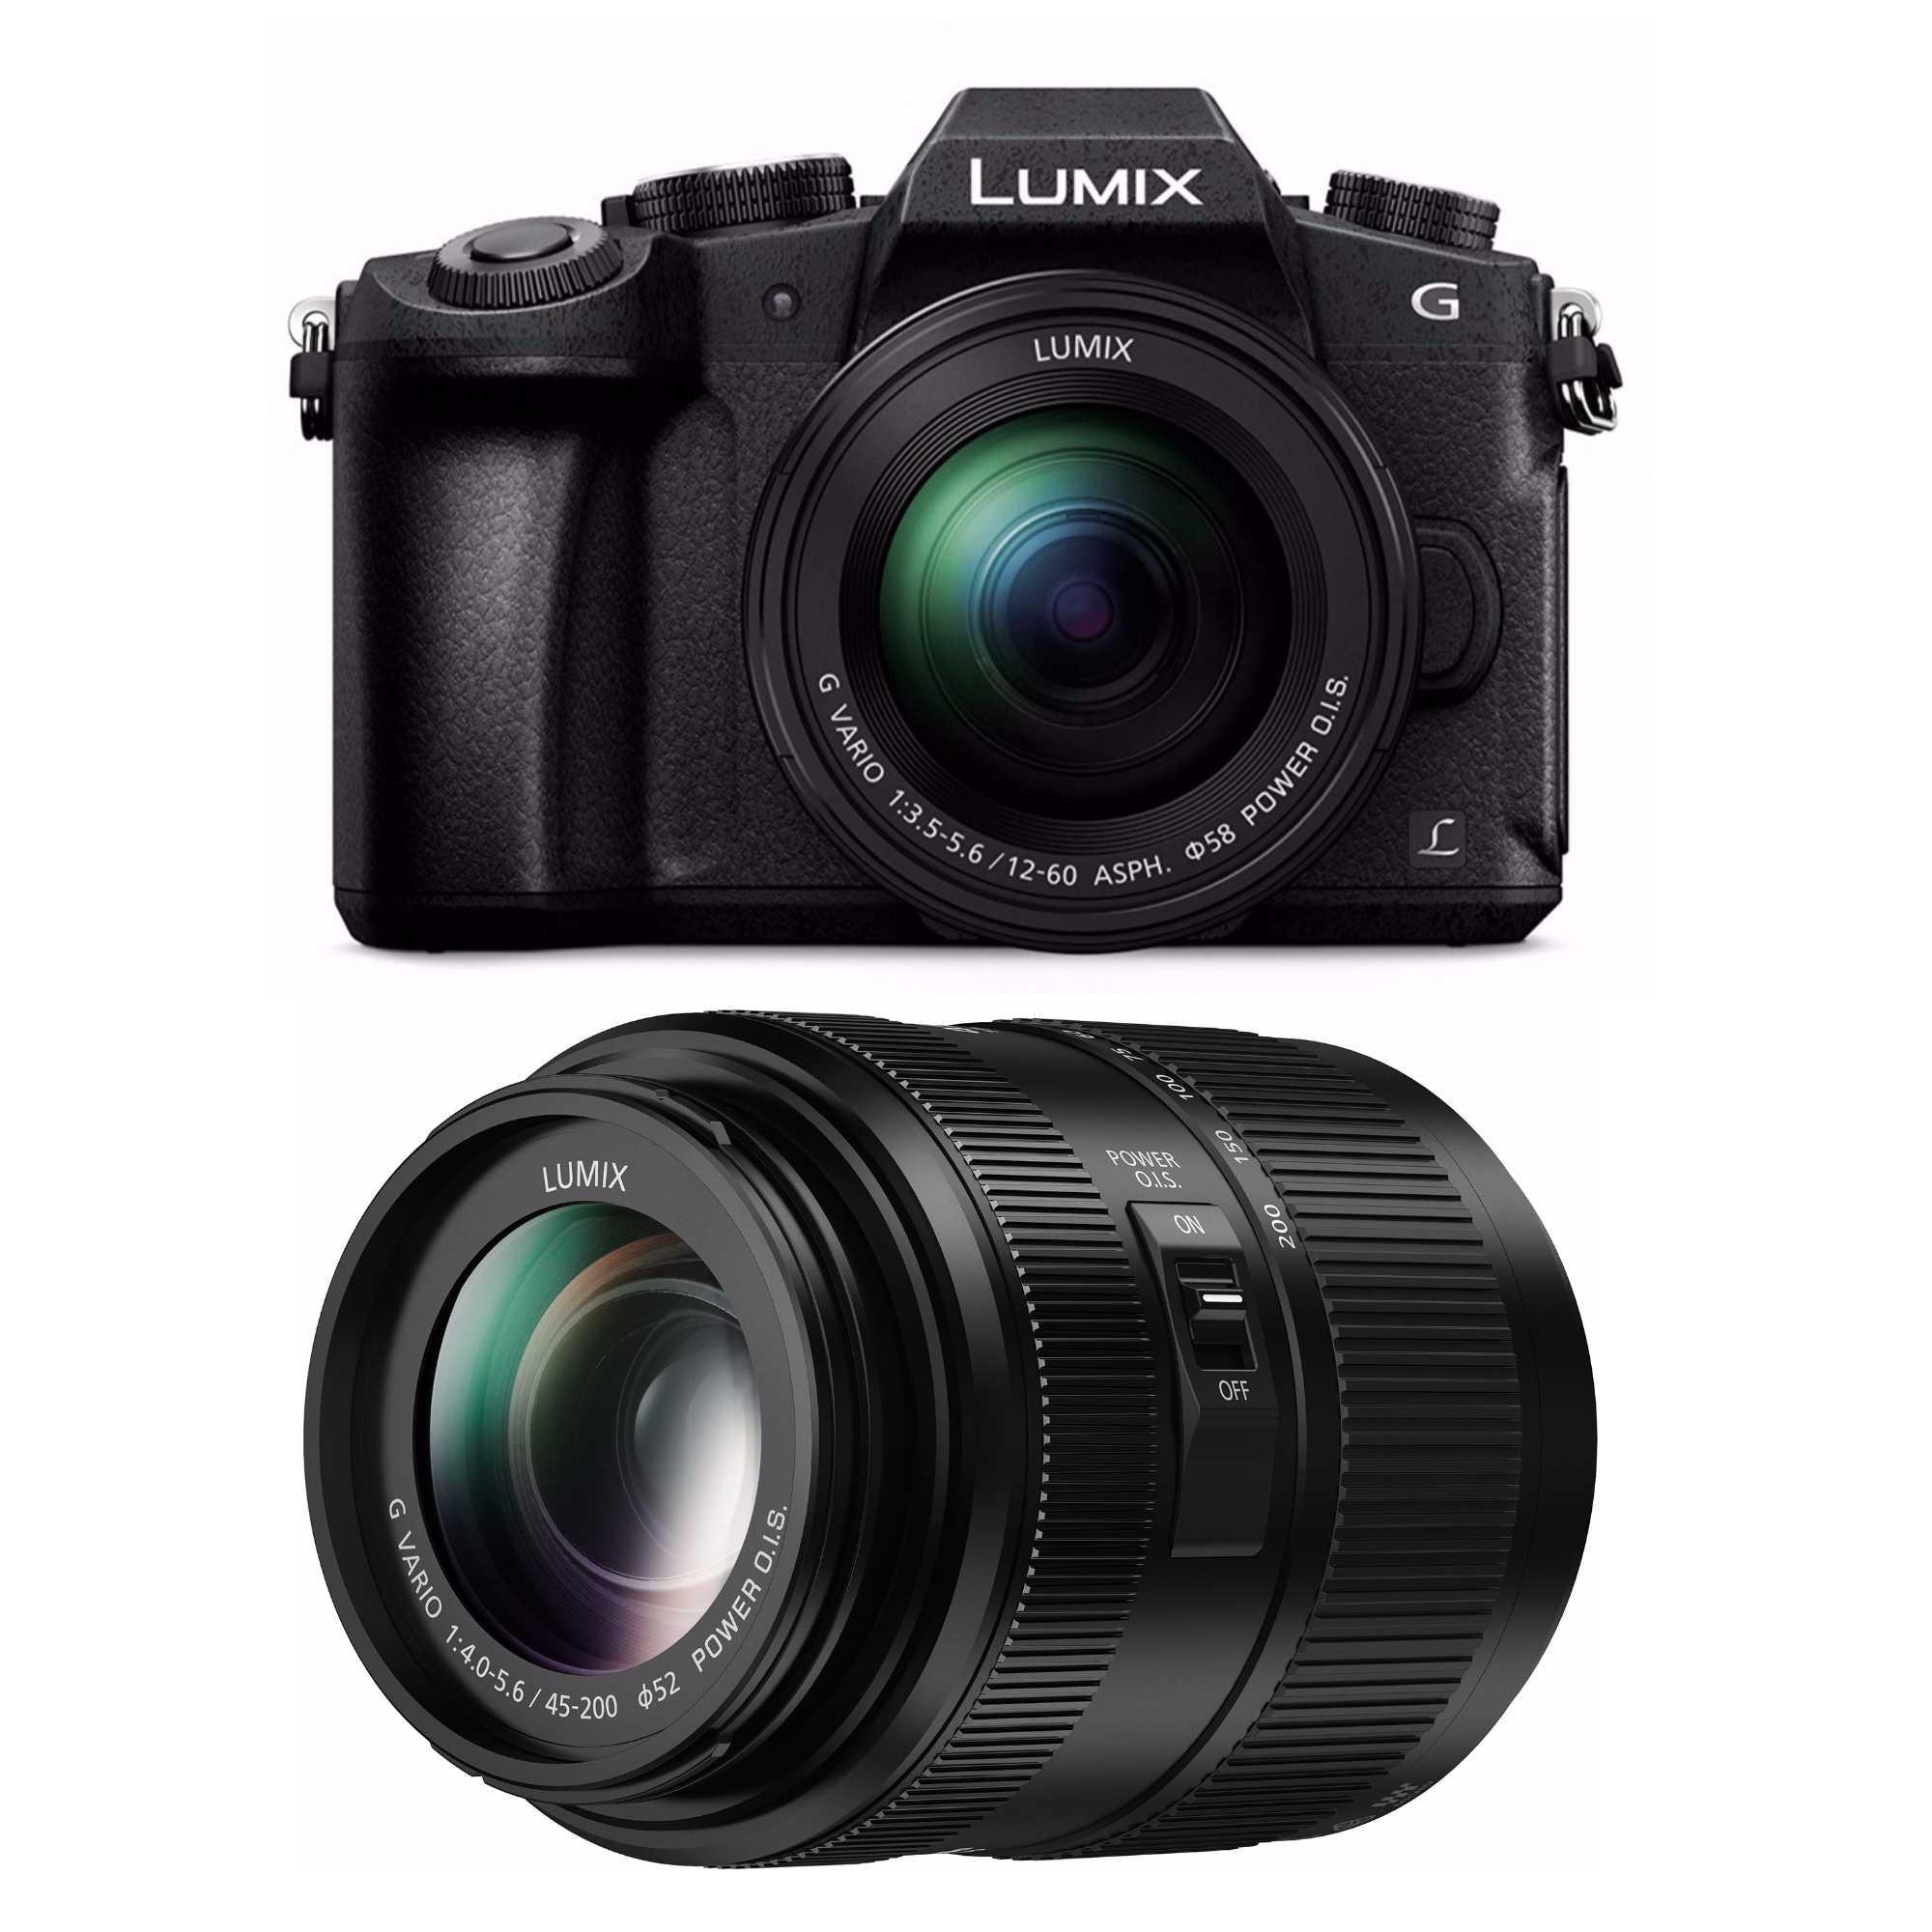 Panasonic G85 Mirrorless Camera w/ 12-60mm & 45-200mm Lenses & More